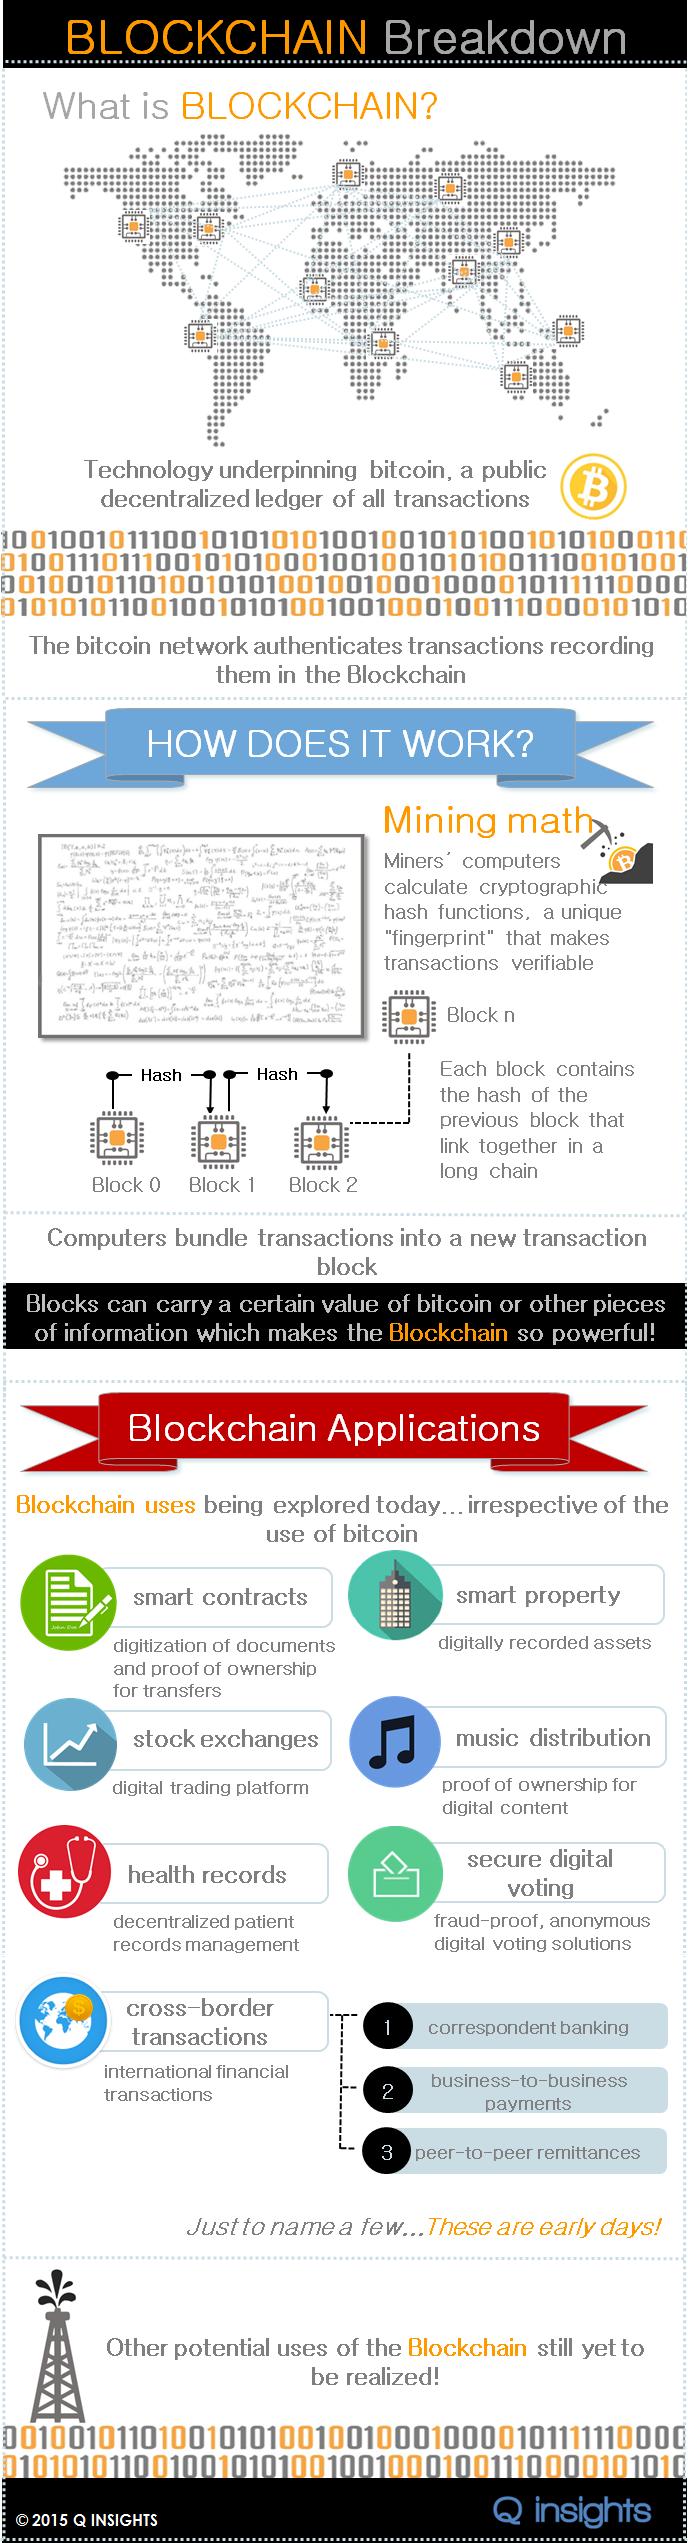 Blockchain Breakdown